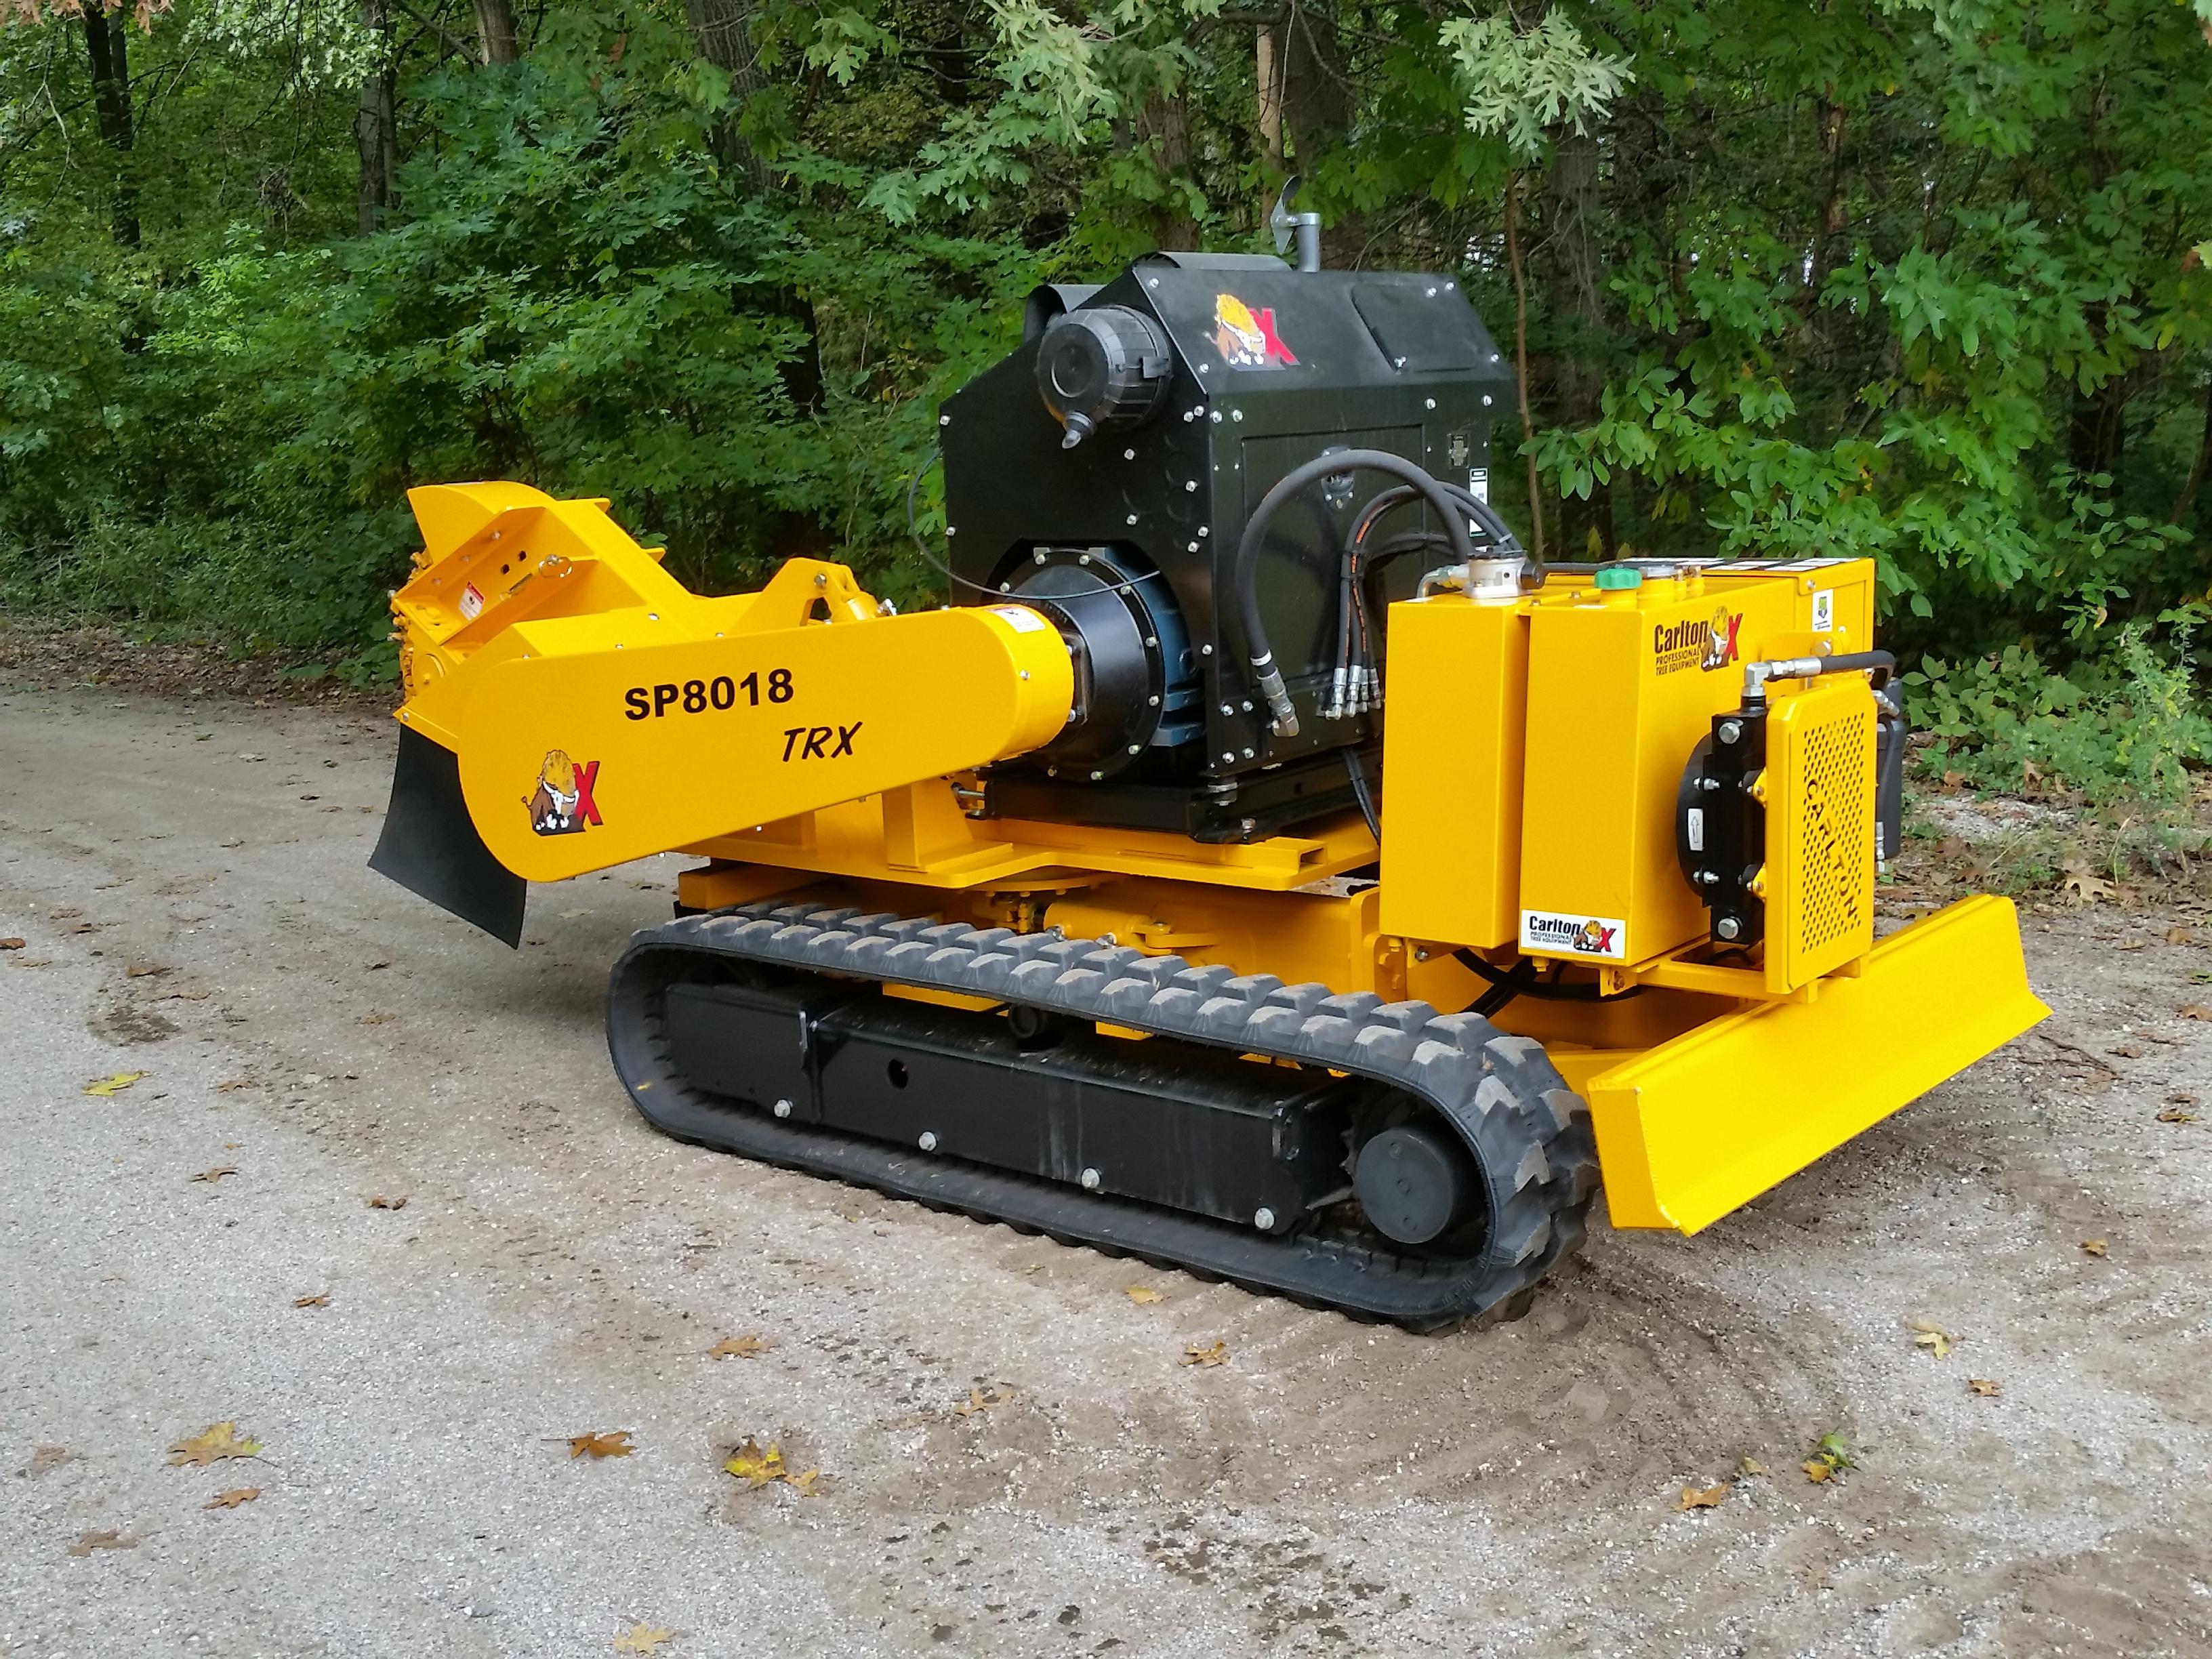 Carlton 8018trx Stump Grinder Demonstrator 87 600